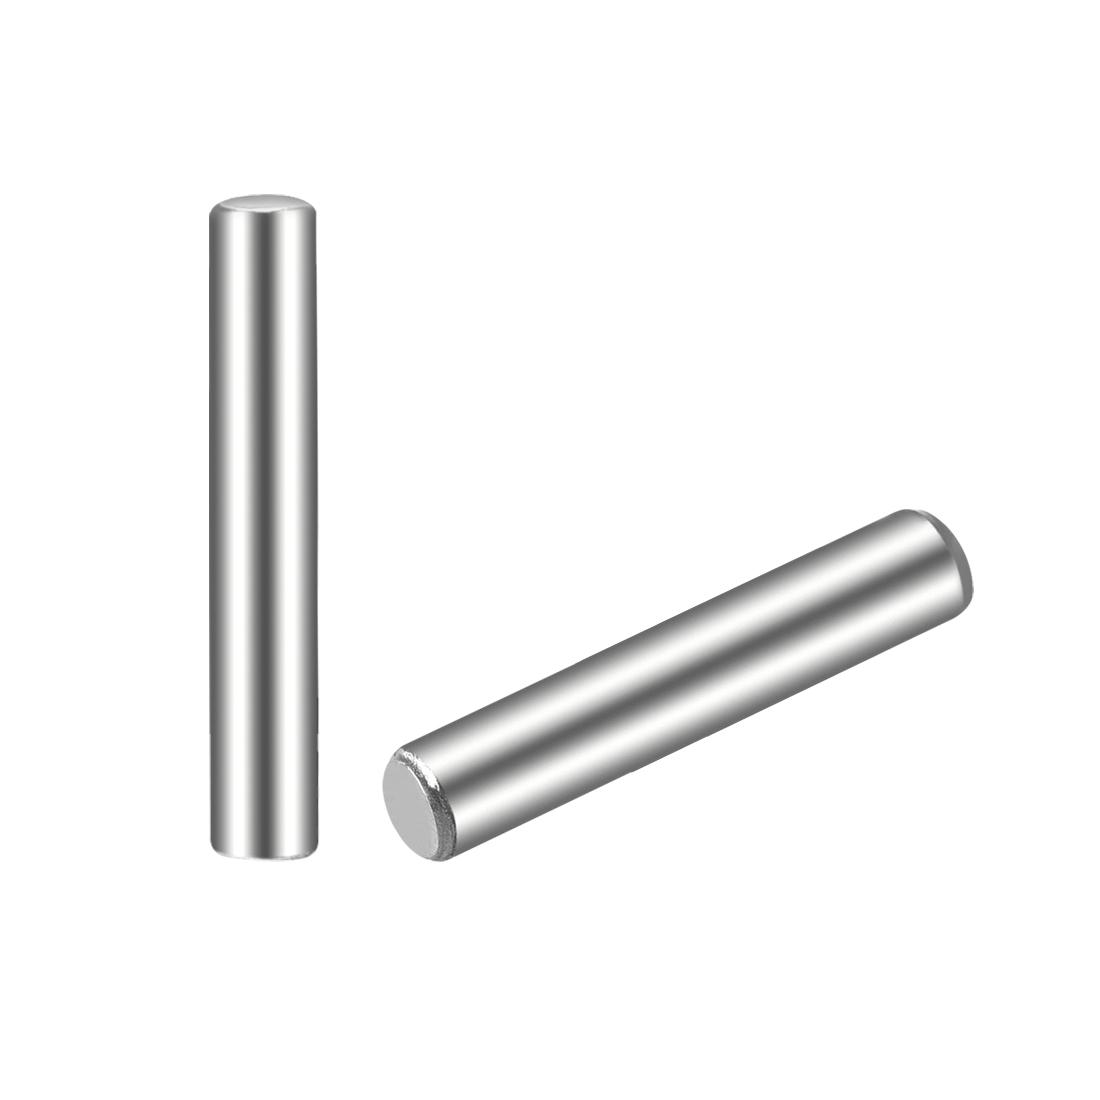 100Pcs 2.5mm x 16mm Dowel Pin 304 Stainless Steel Shelf Support Pin Fasten